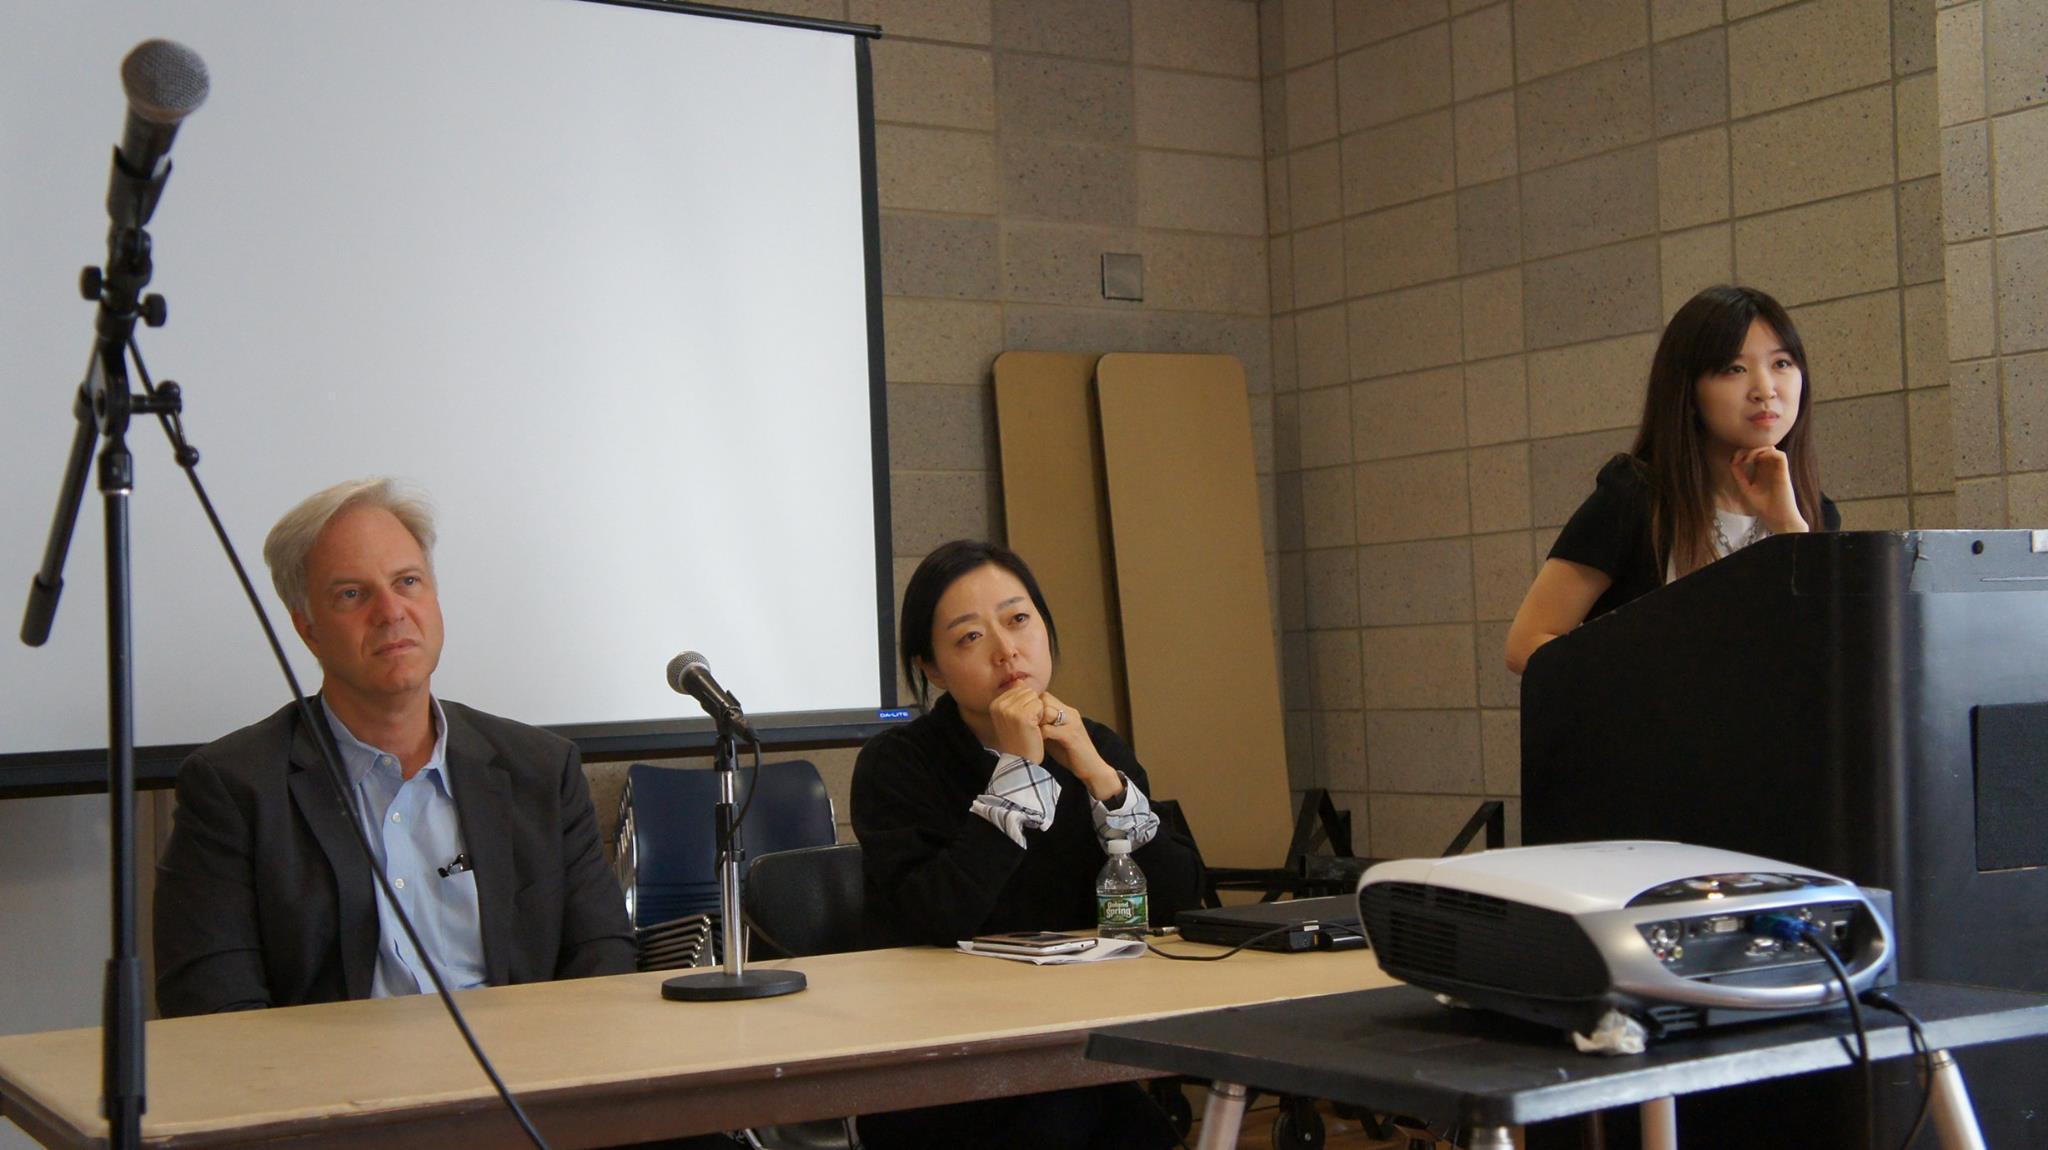 Panelists Robert Moynton and Euna Lee at the Freedom for North Korea Intercollegiate Conference.